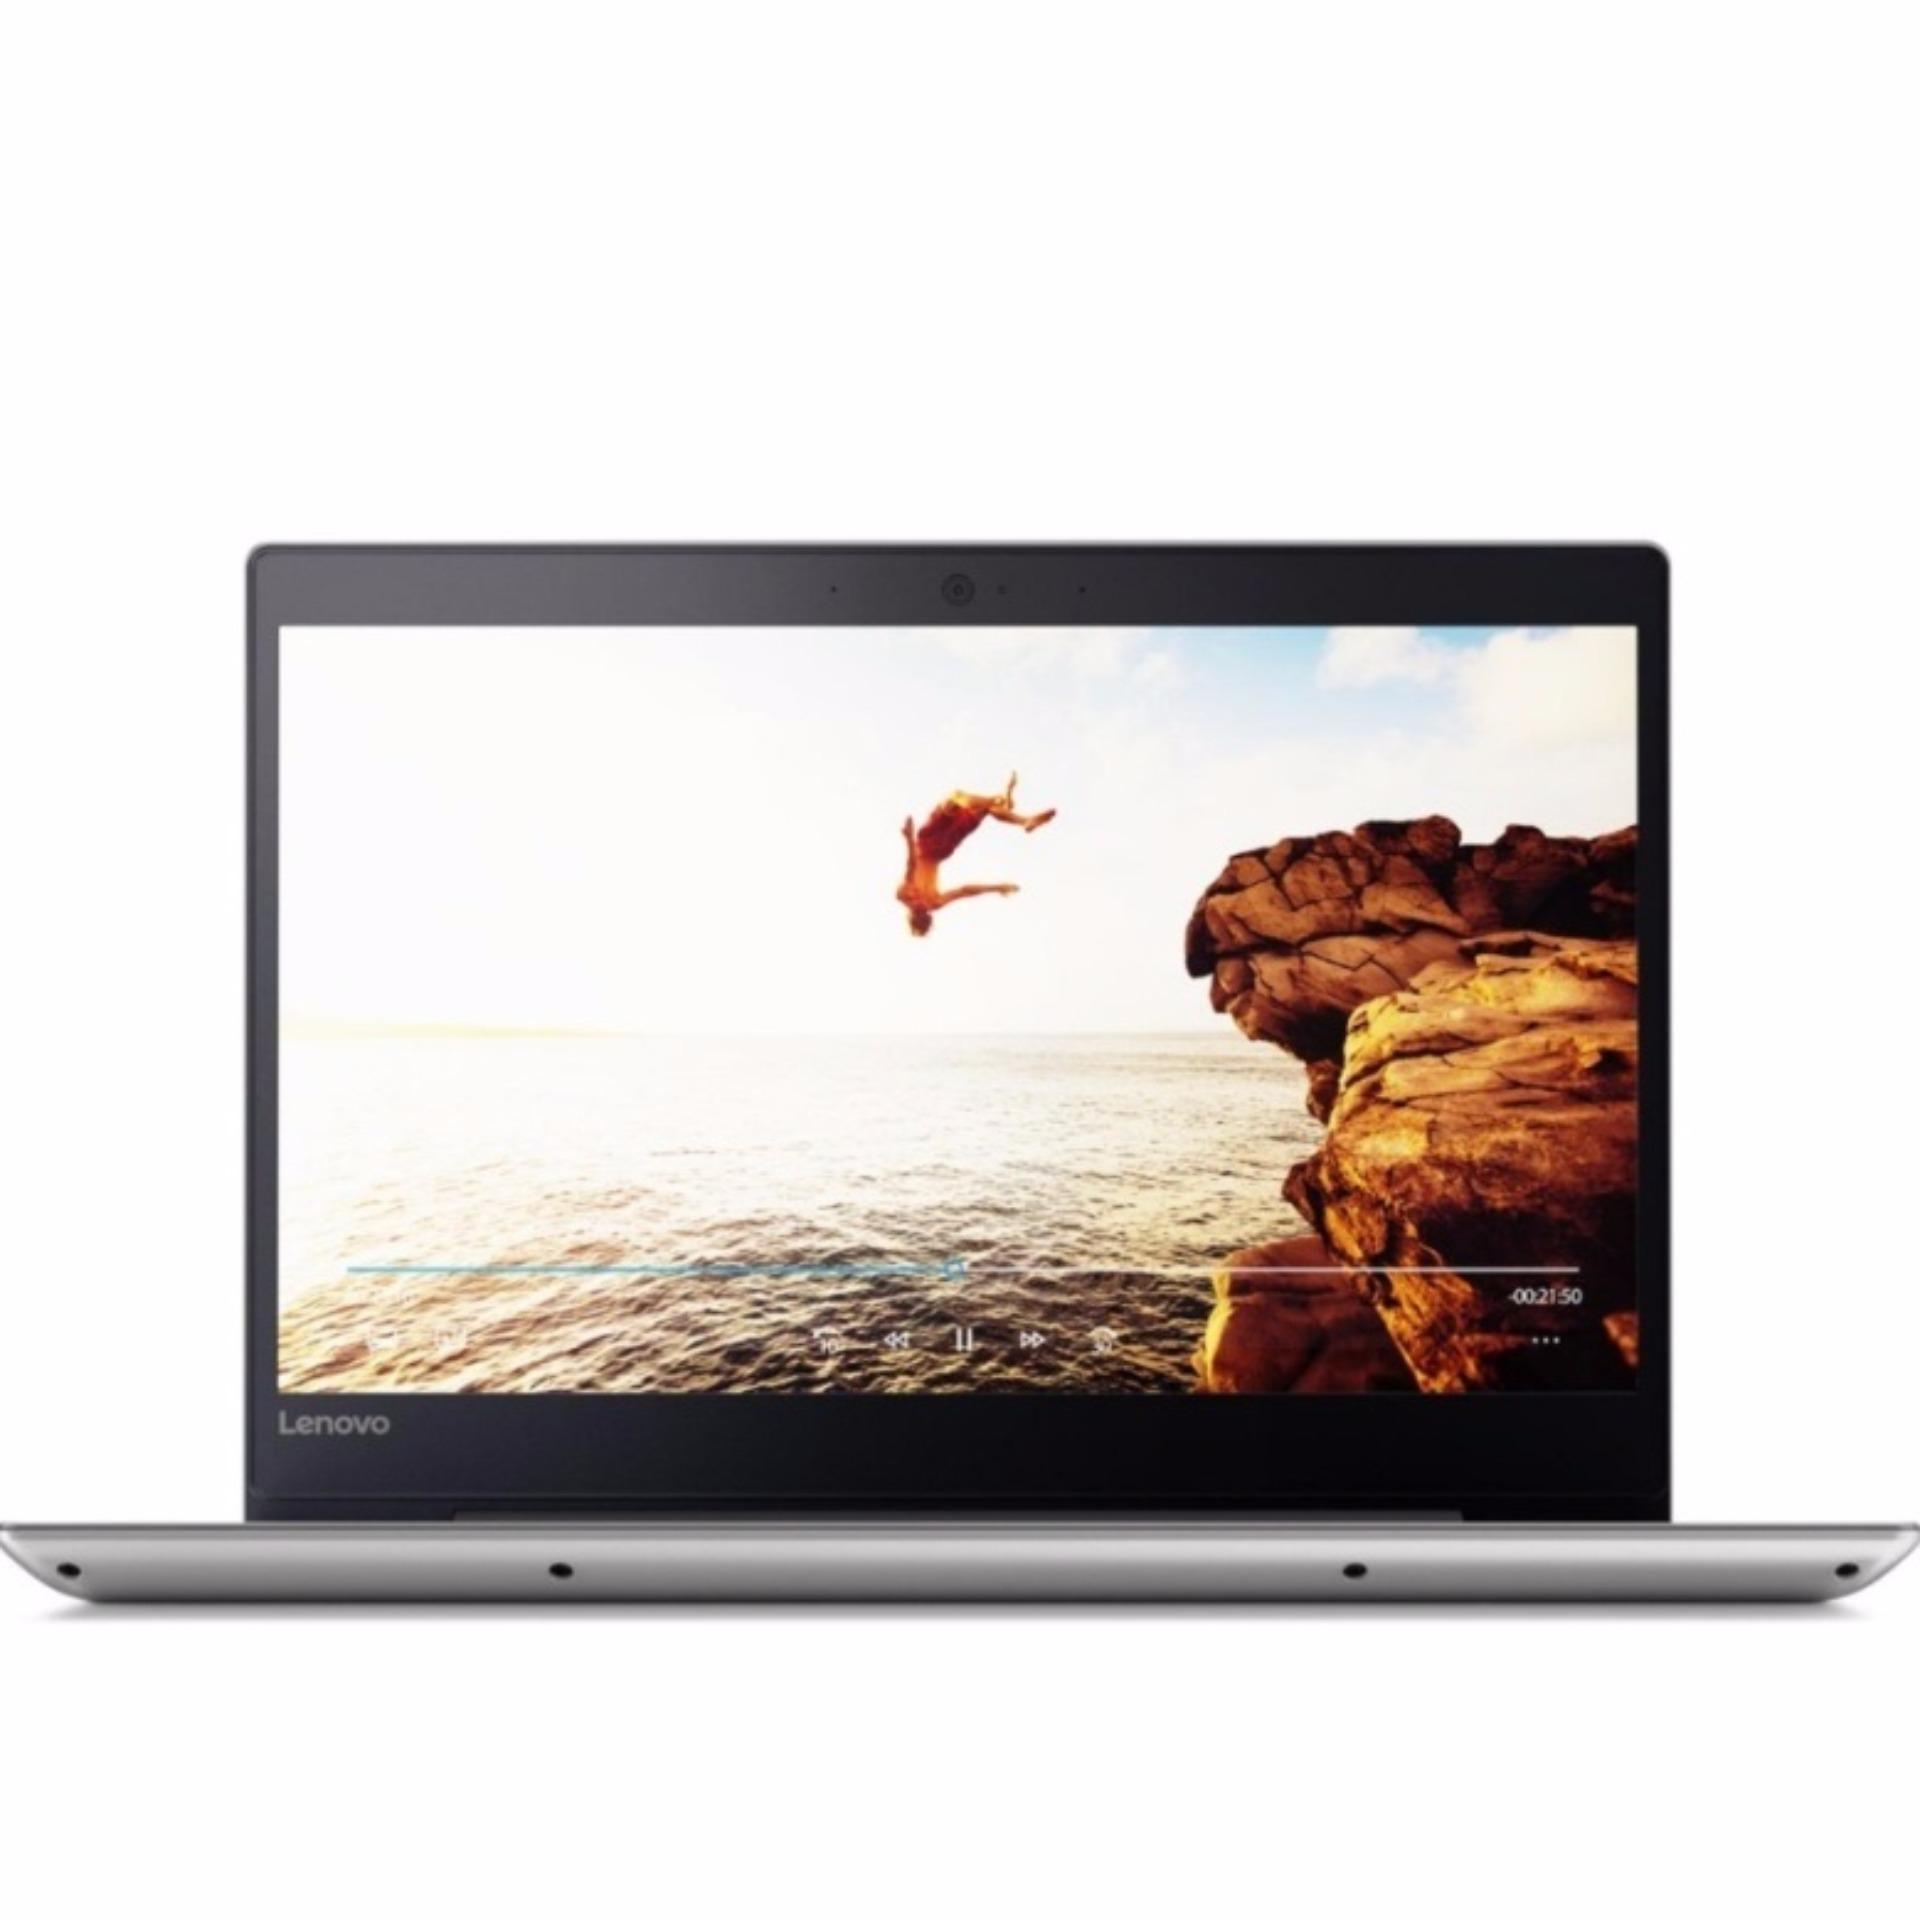 Lenovo IdeaPad 320S-13IKB 81AK000LSB 13.3 FHD IPS AG(SLIM) INTEL® CORE™ i5-8250U QUAD CORE PROCESSOR Graphic: INTEGRATED 8G DDR4 2400 ONBOARD...